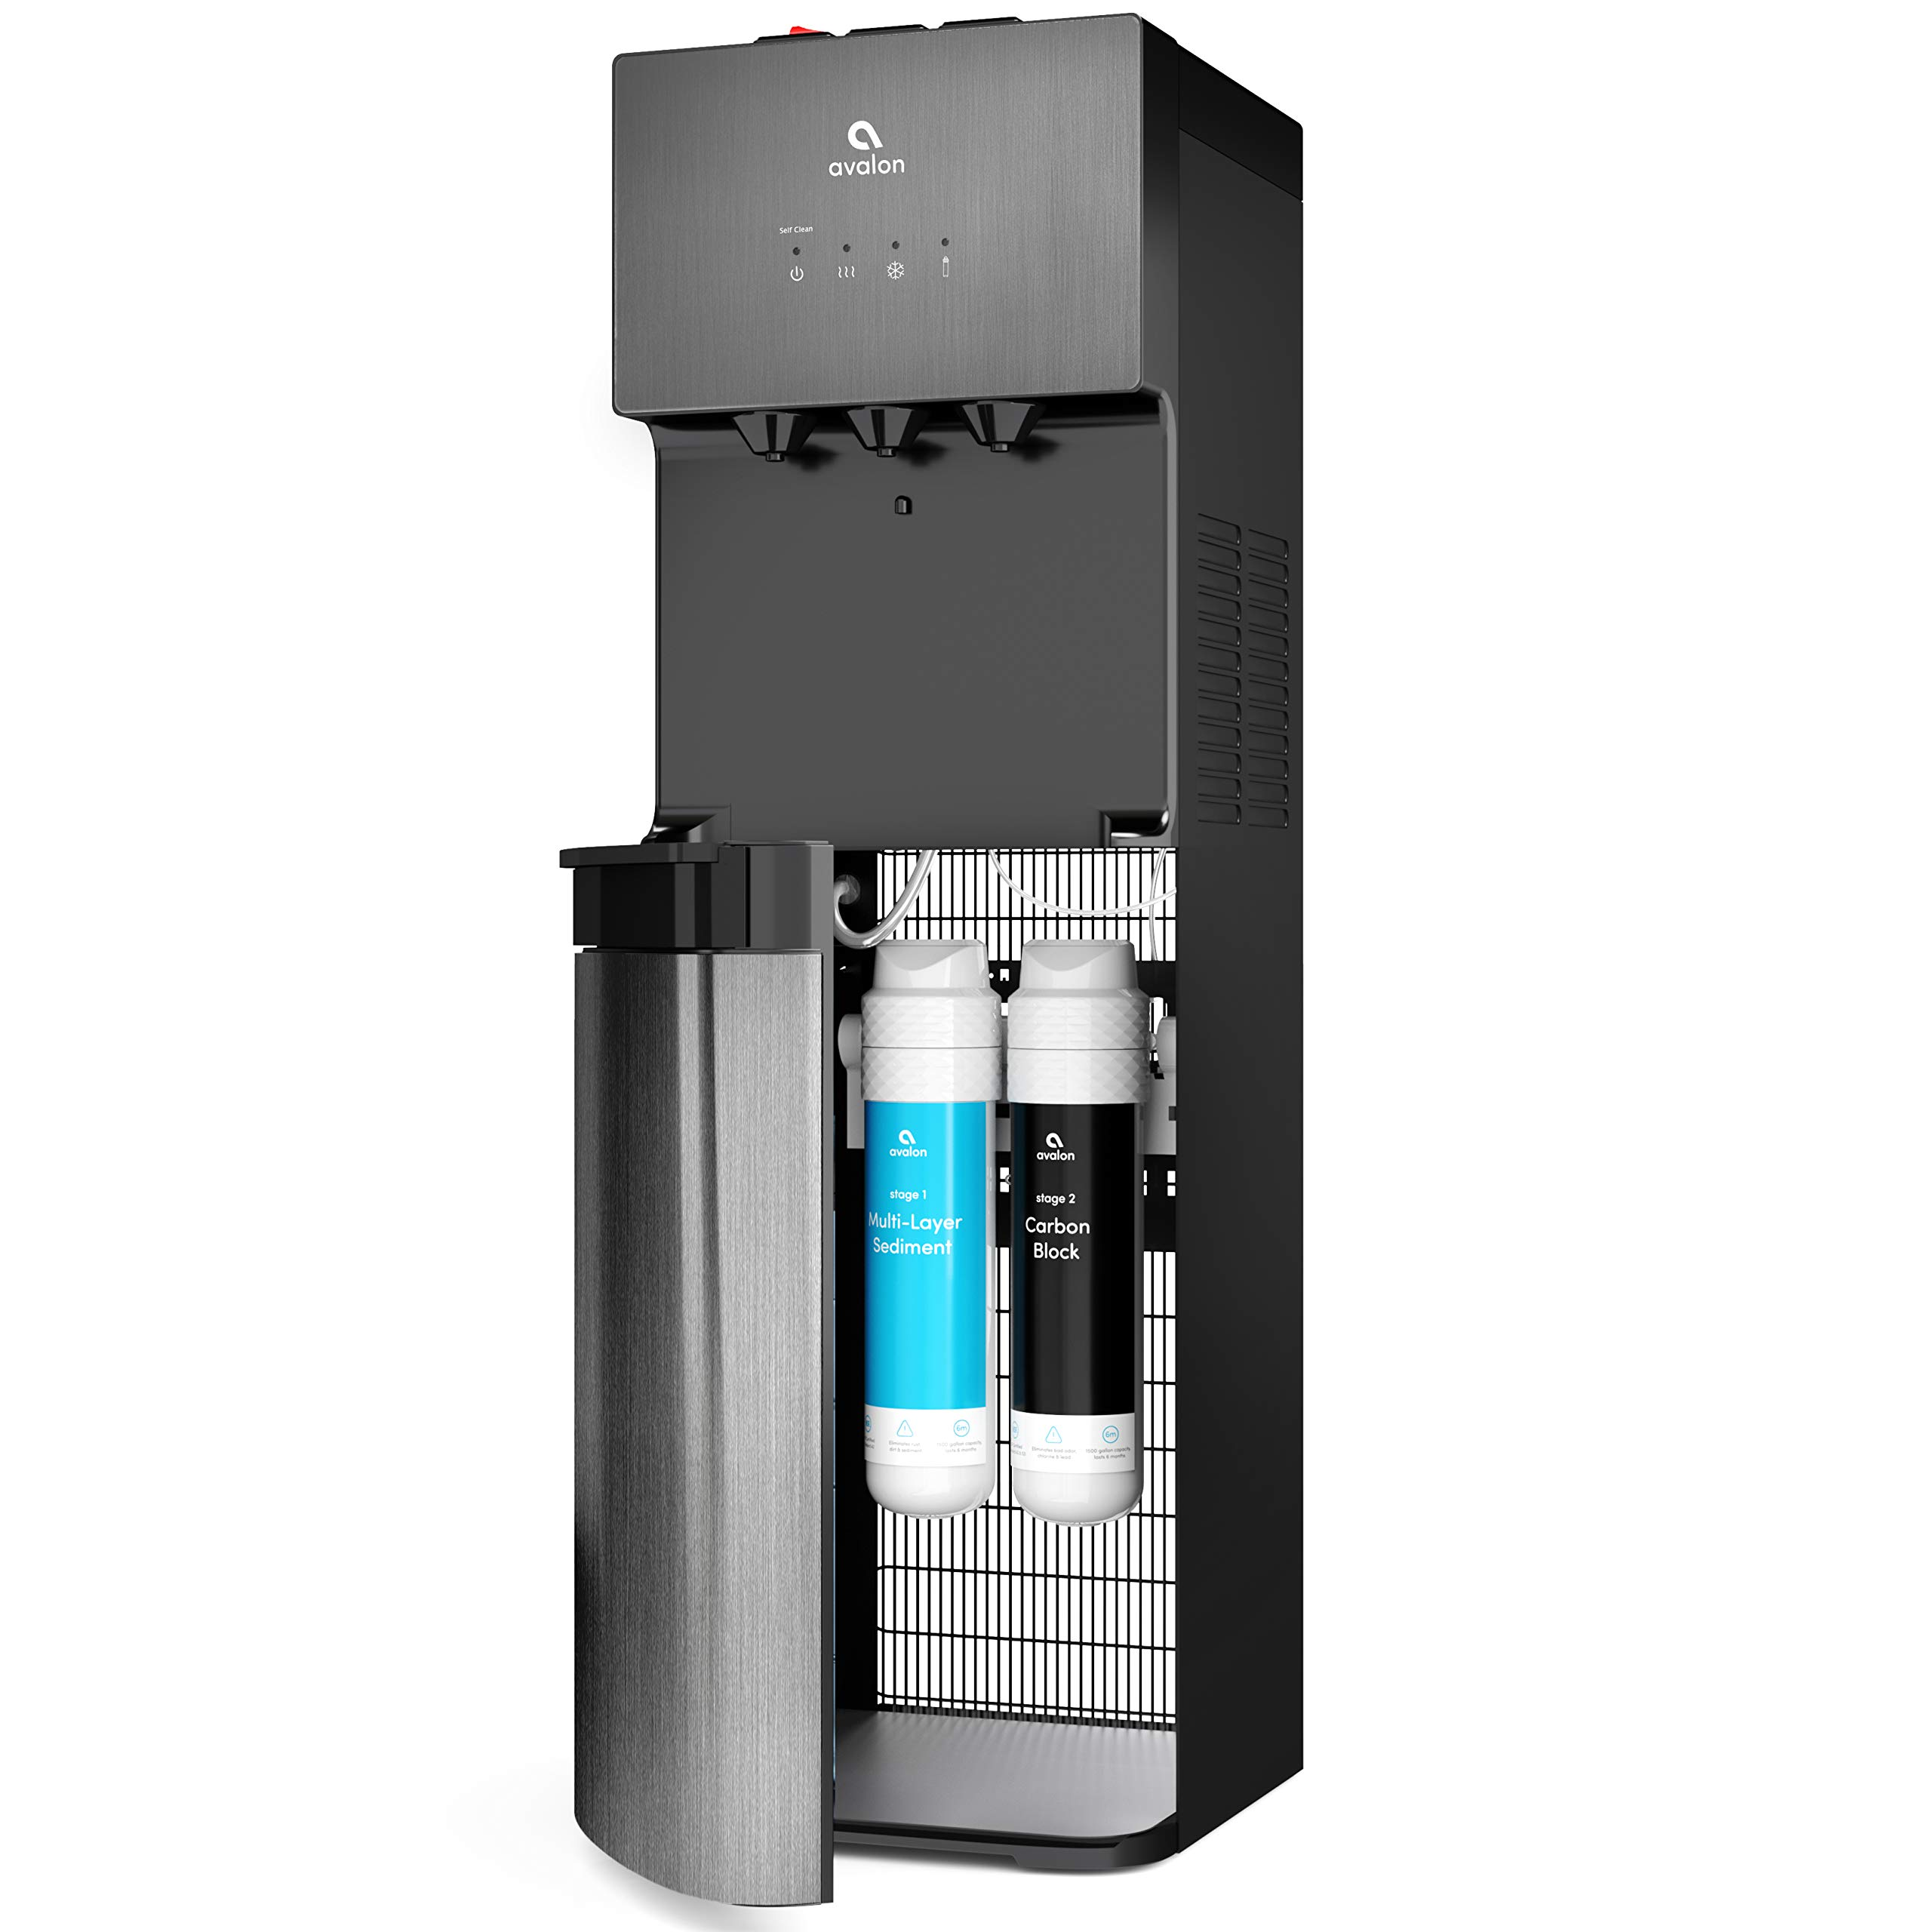 Avalon A5BLK Self Cleaning Bottleless Water Cooler Dispenser, UL/NSF/Energy Star, Black Stainless Steel by Avalon